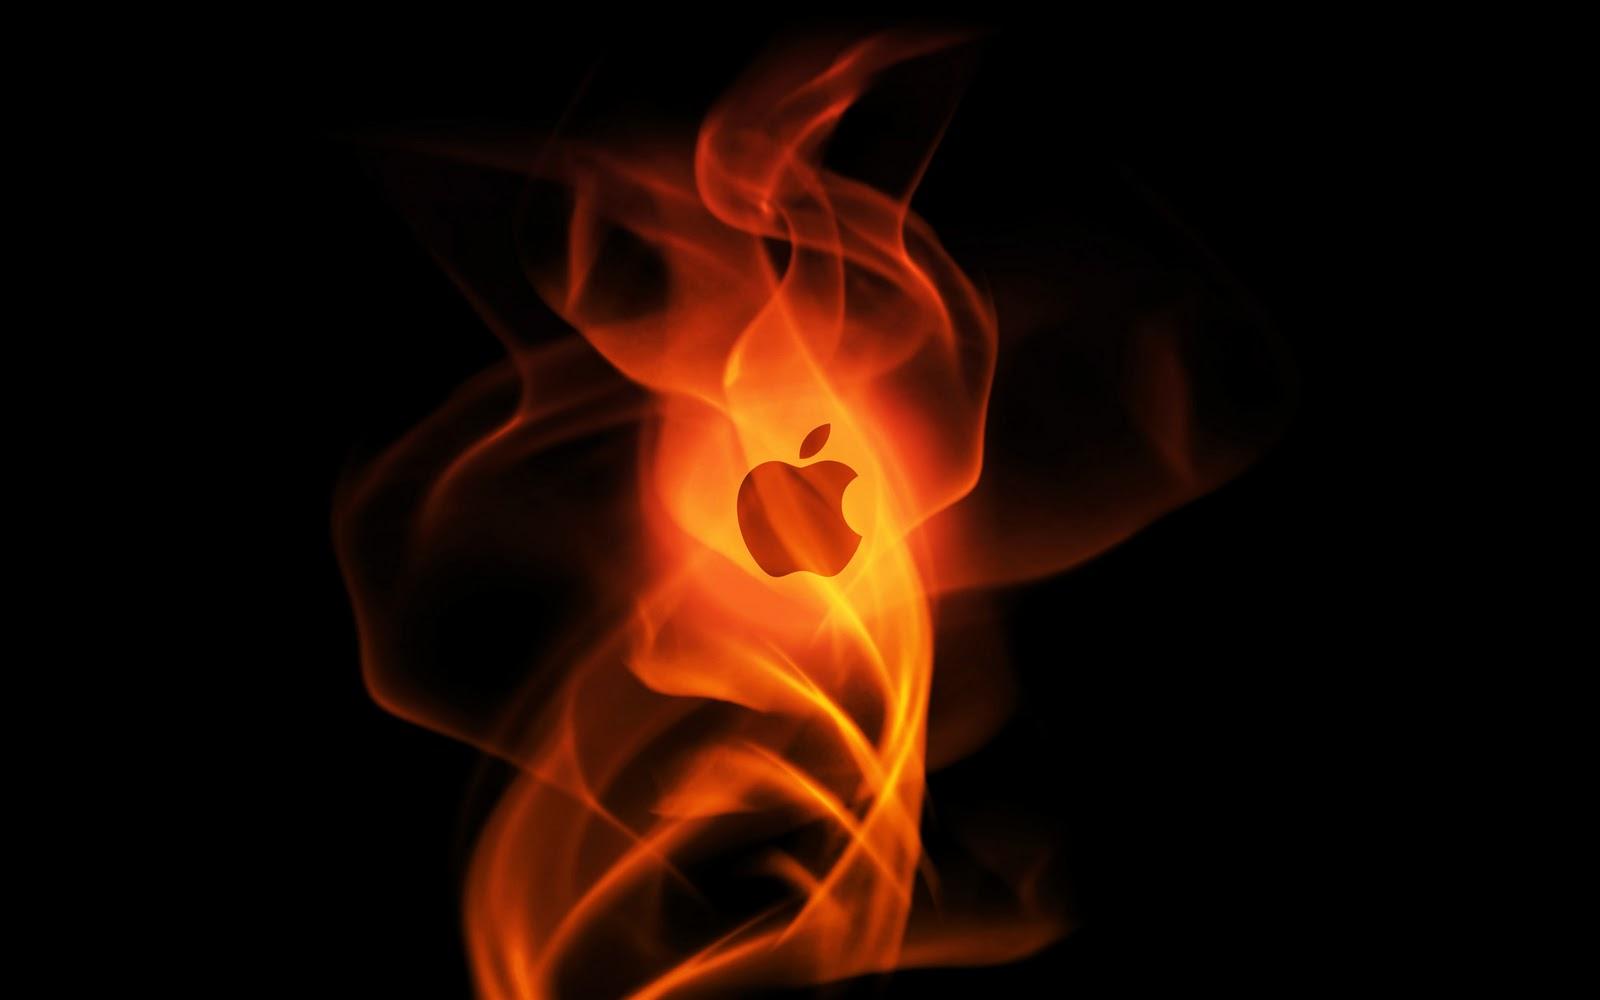 http://3.bp.blogspot.com/_vTQcDXfTeUo/TM29QiMBHLI/AAAAAAAAApg/ETvA7UUXPzA/s1600/apple_mac_013.jpg